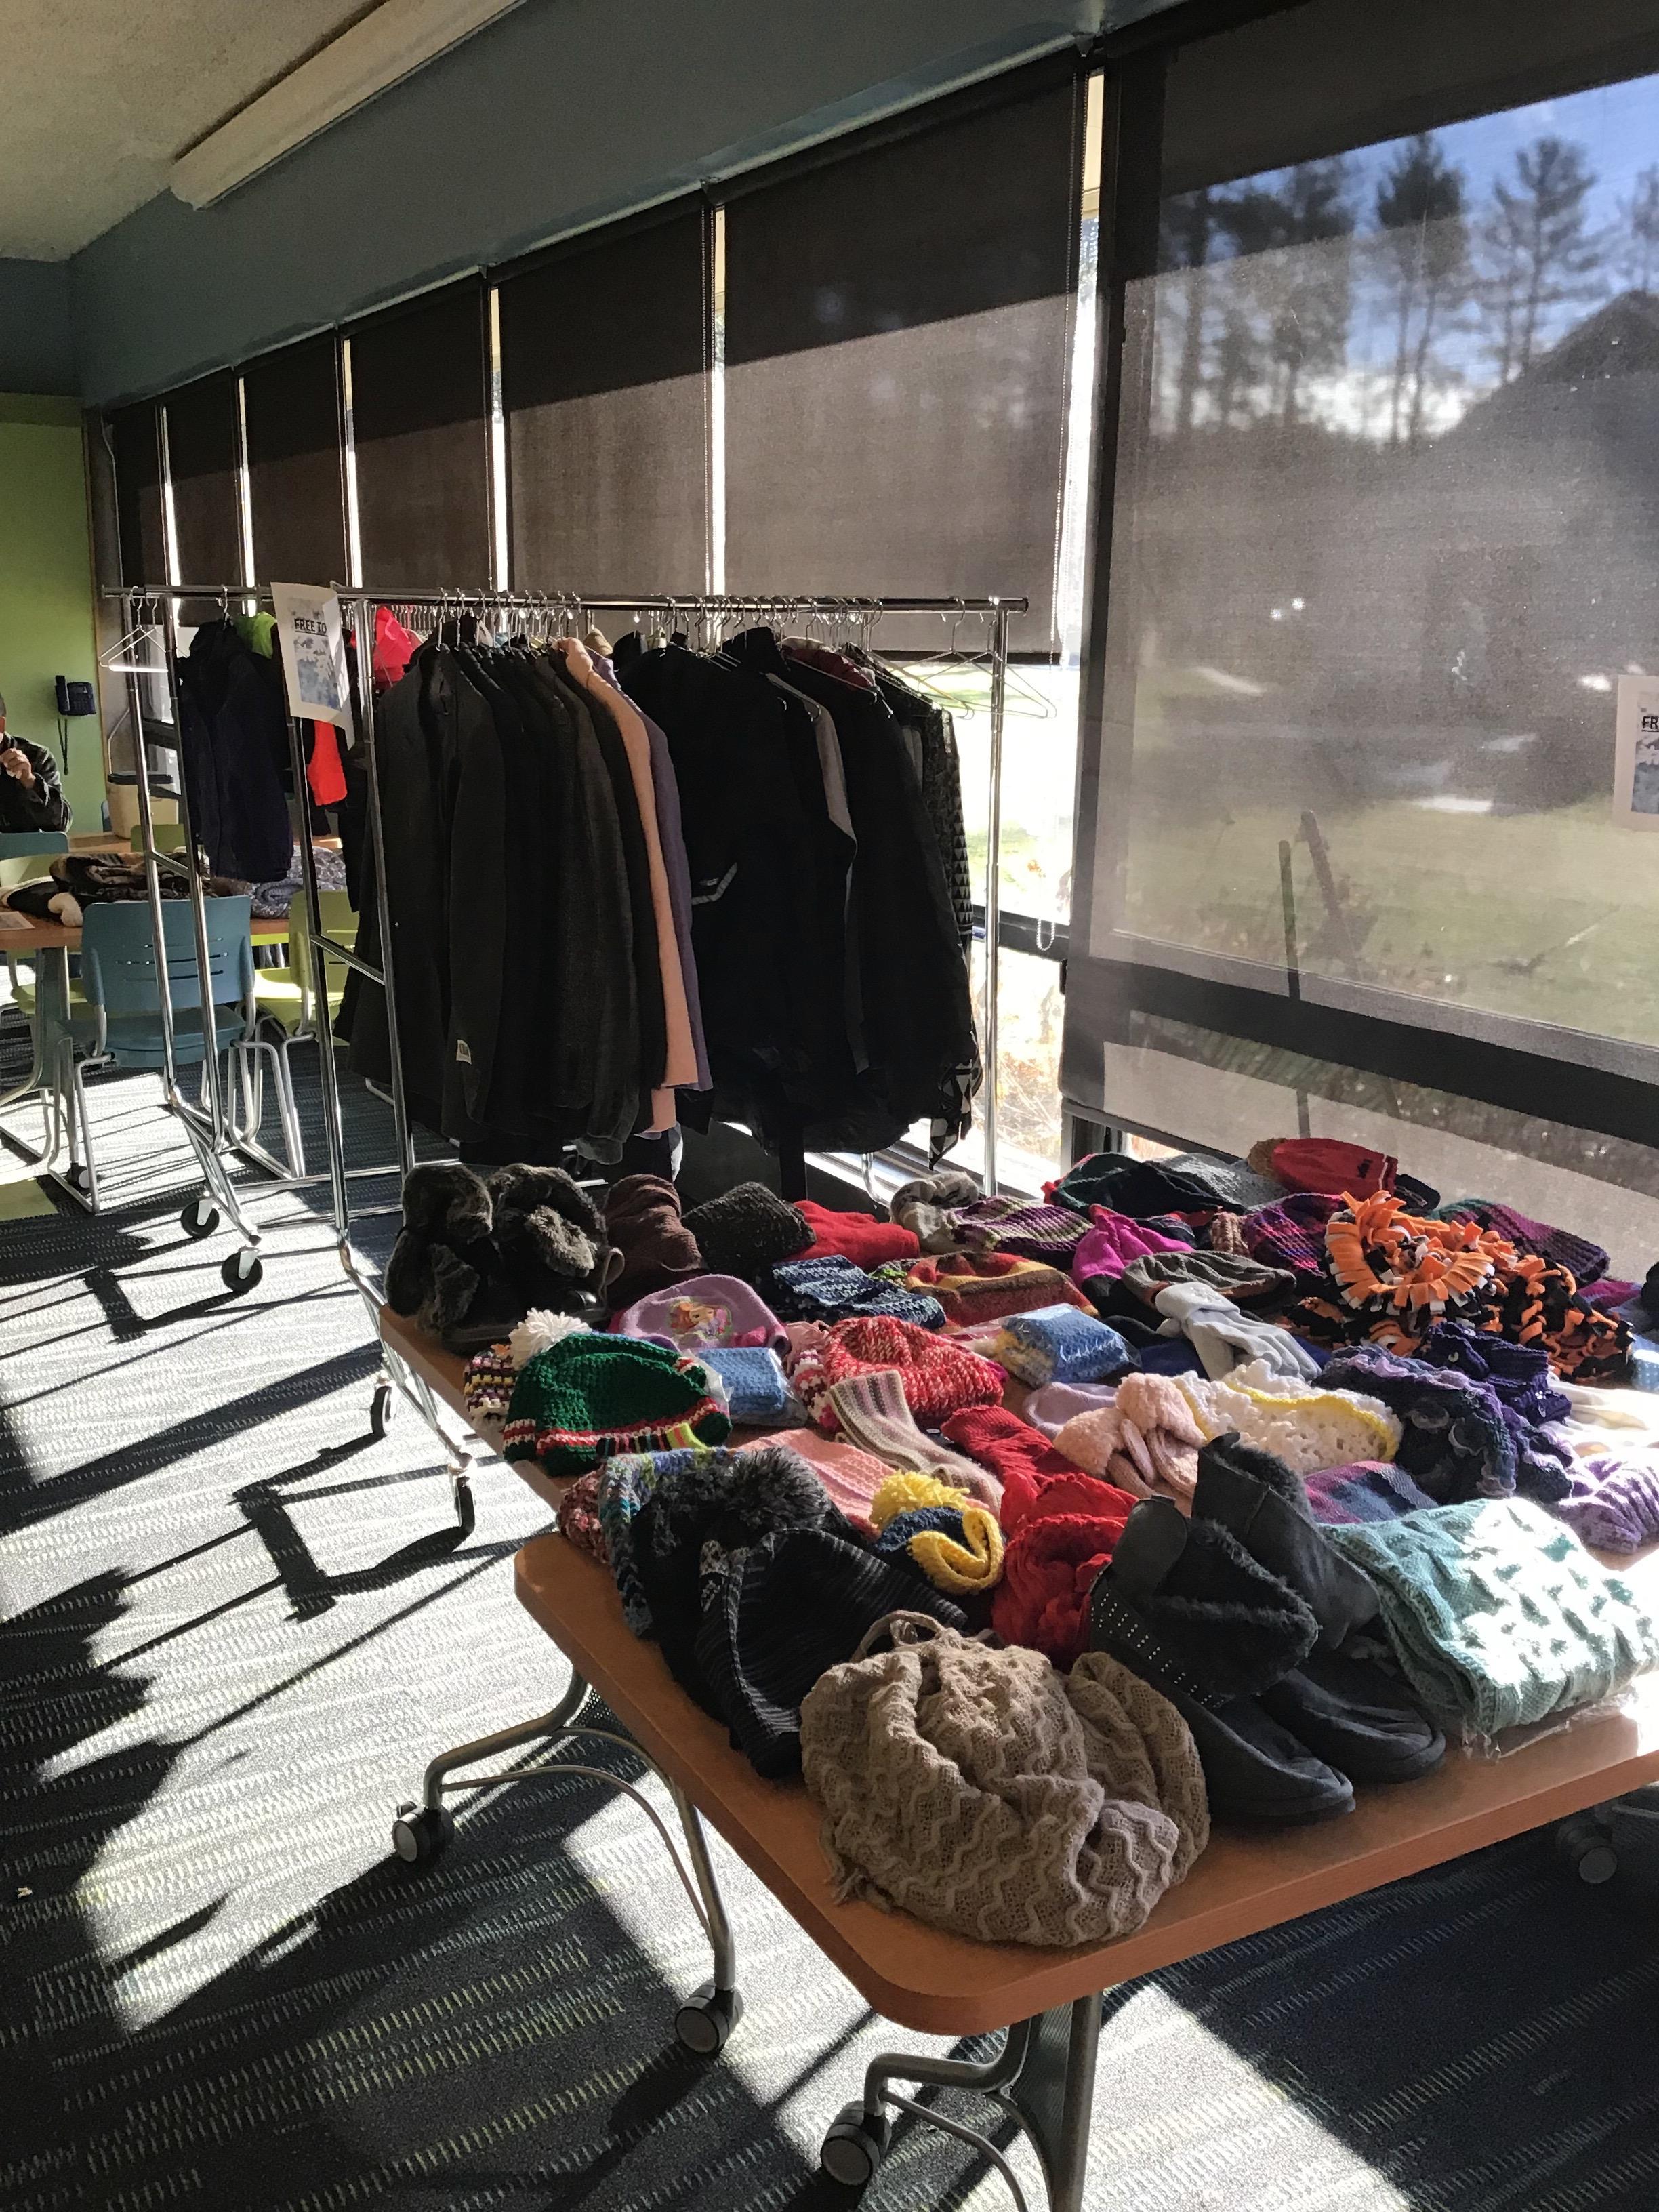 clothing hangs on hangers